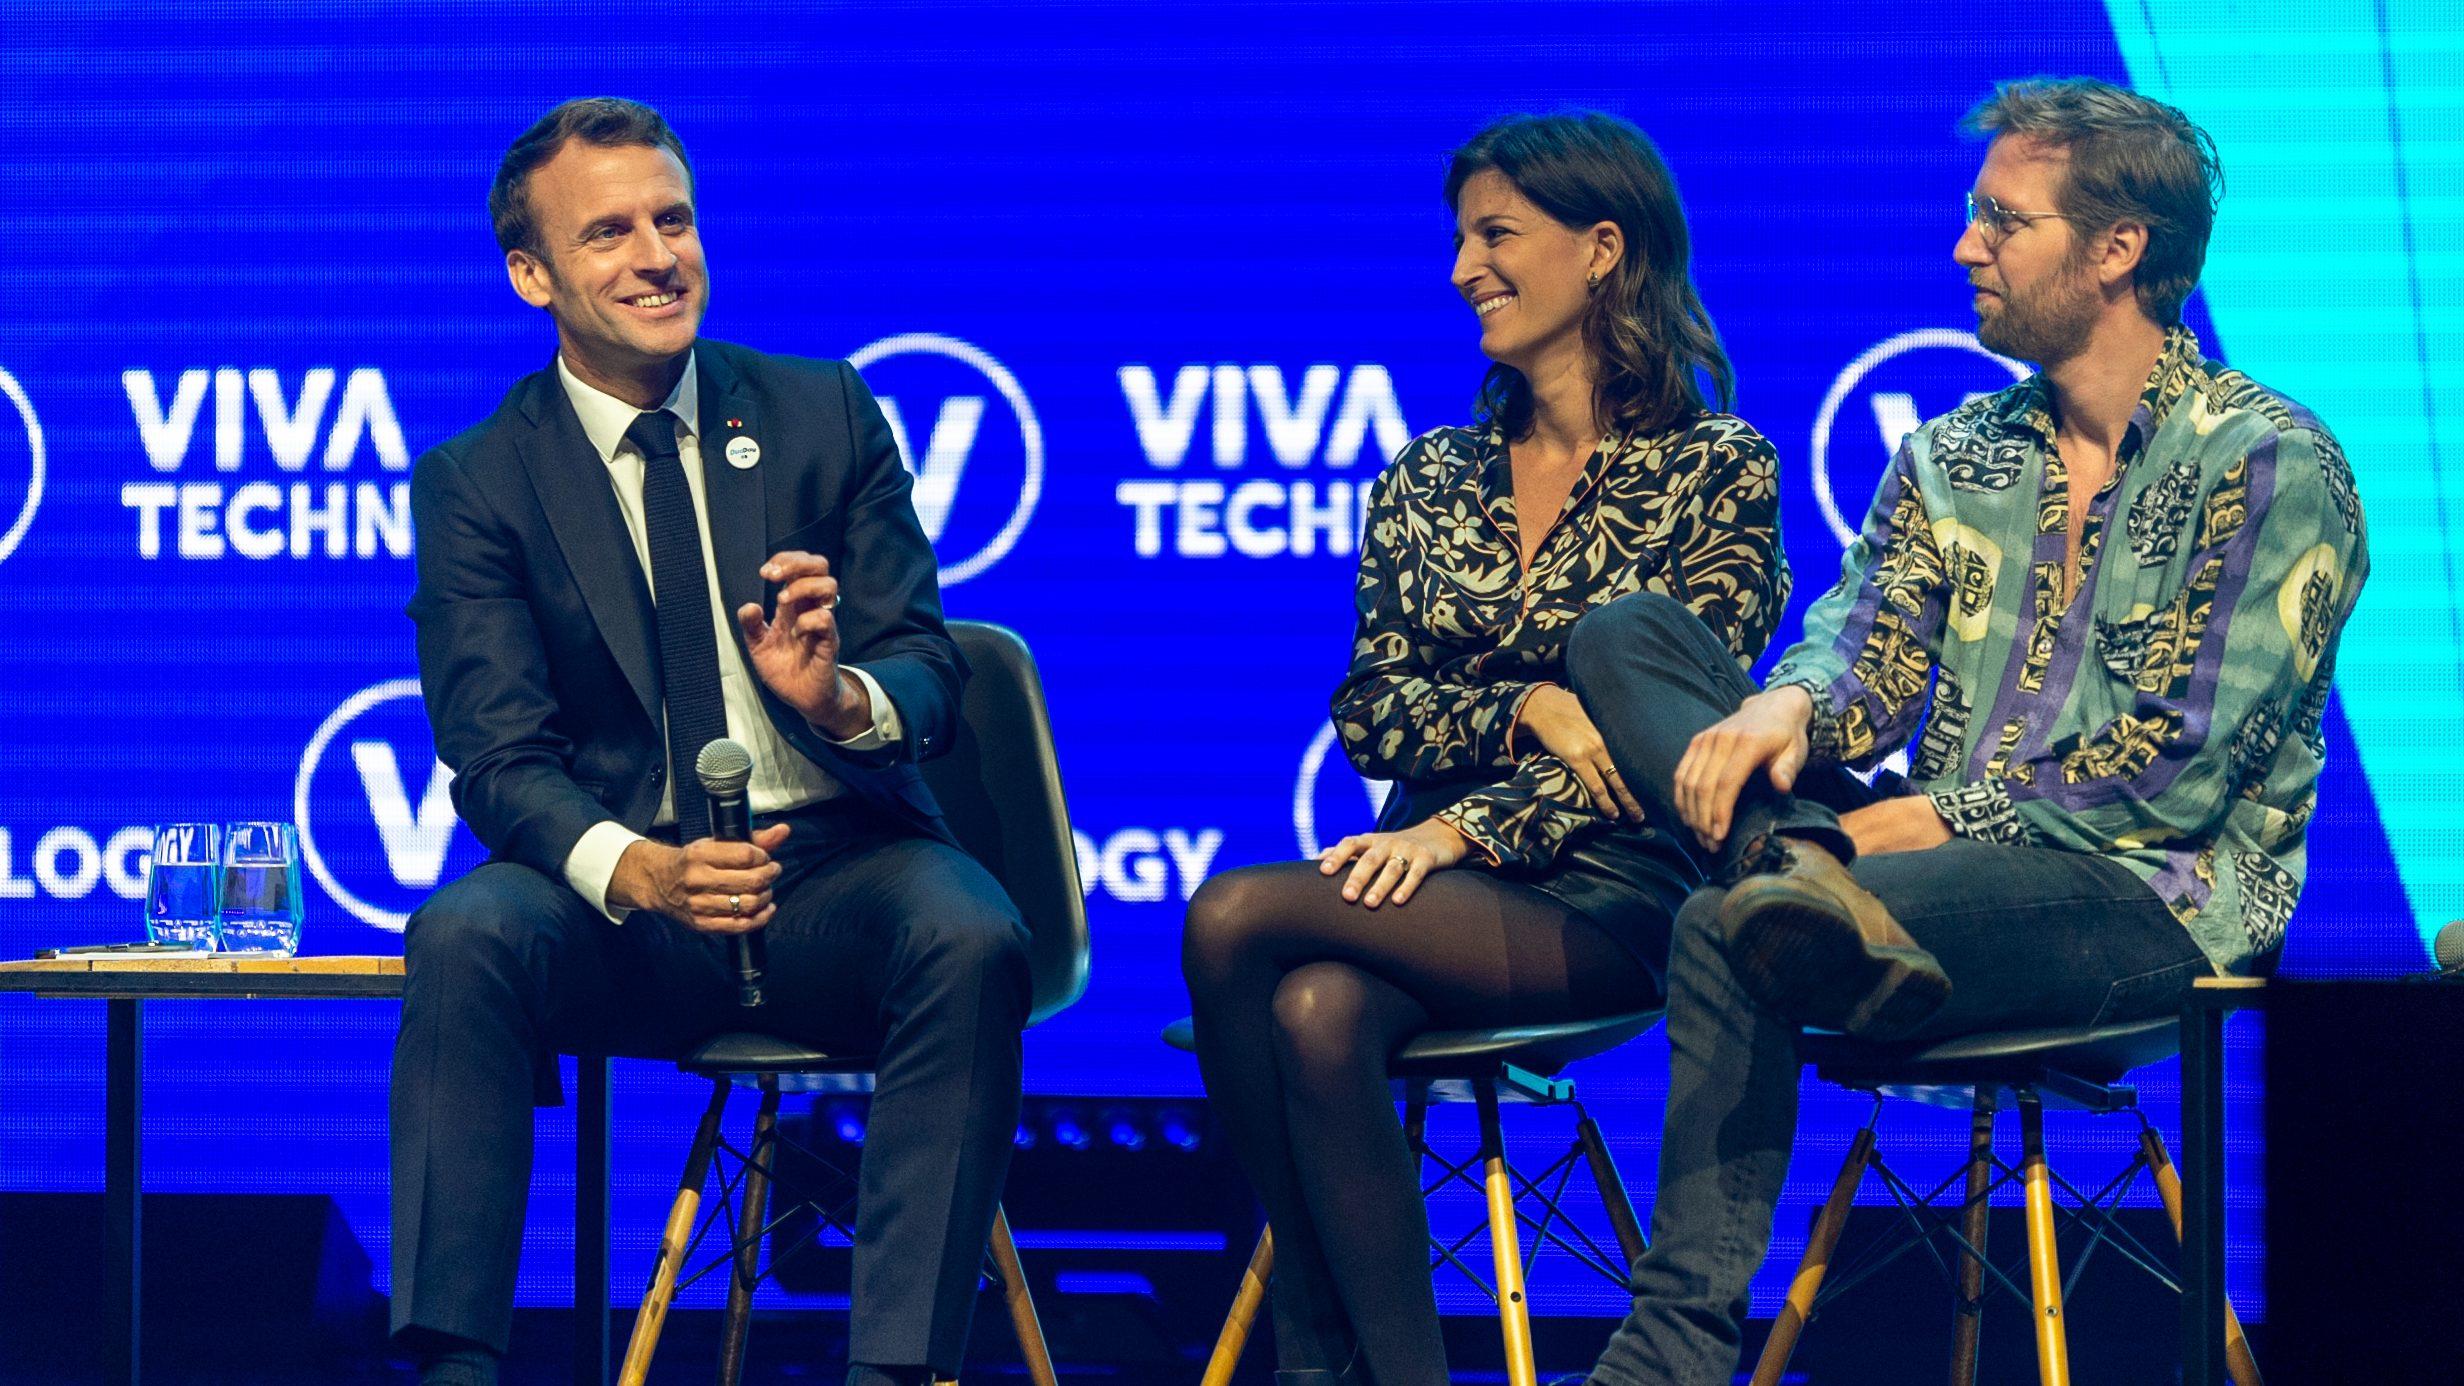 Emmanuel-Macron-Vivatech-2019